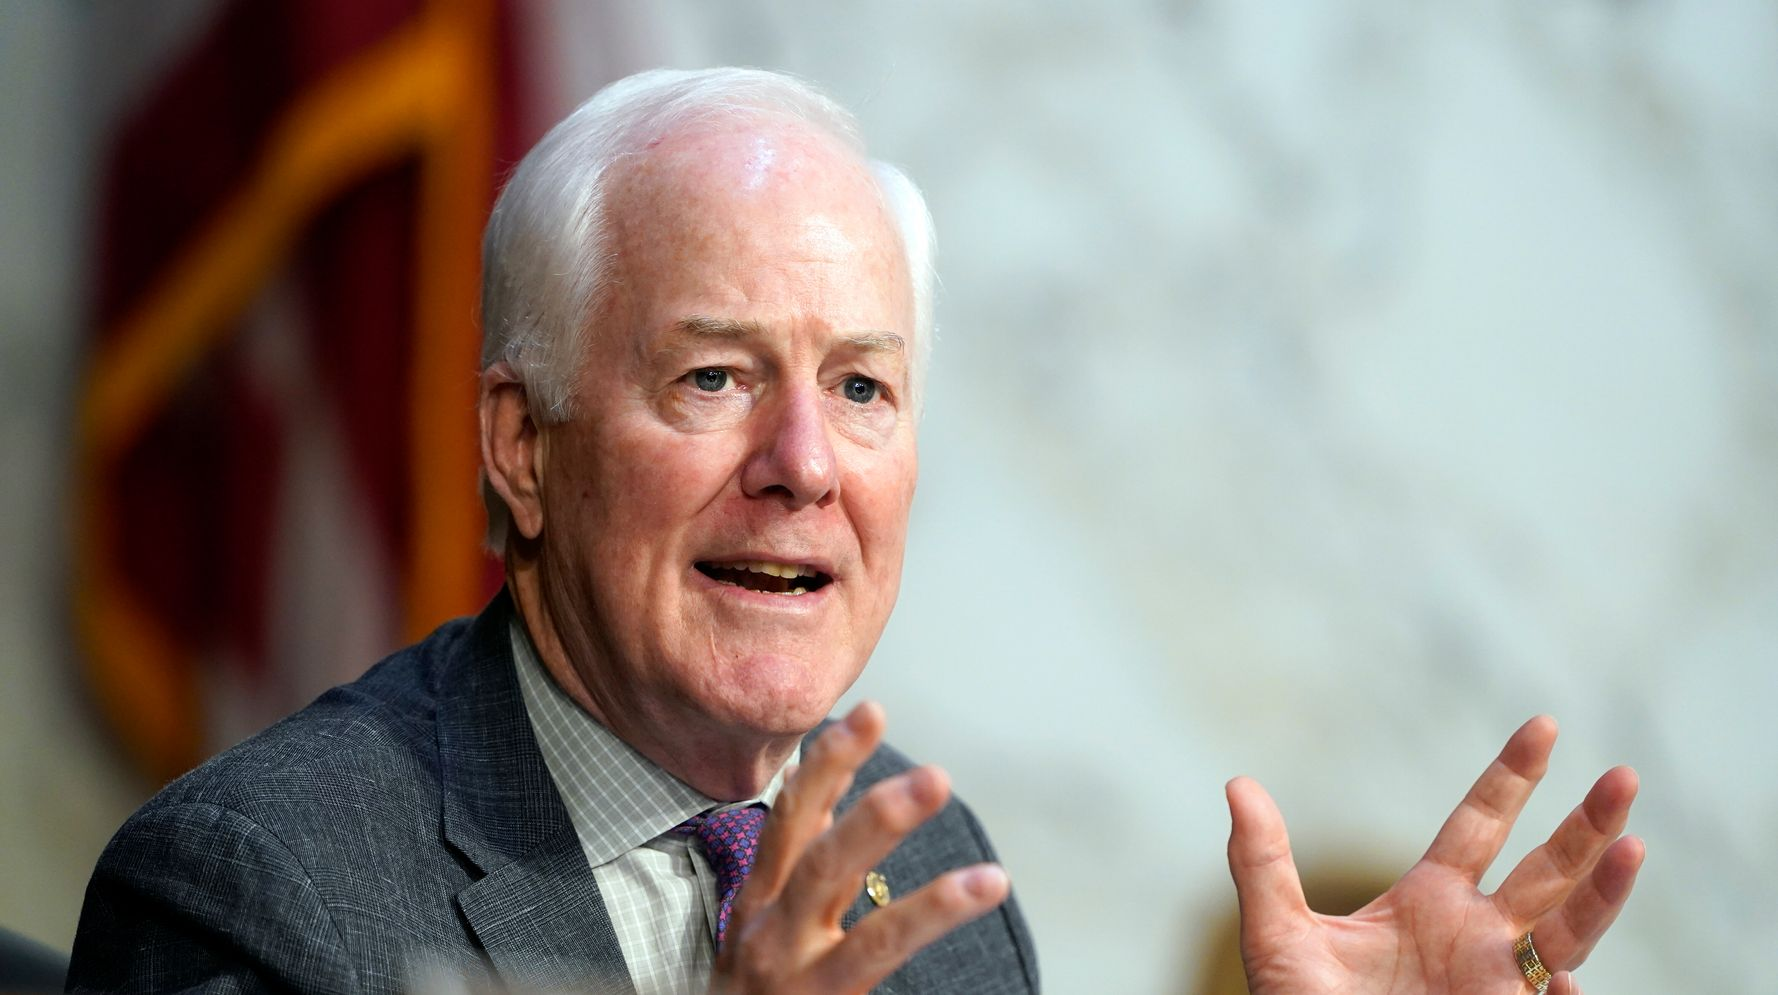 John Cornyn Hangs On To Beat M.J. Hegar In Texas Senate Race